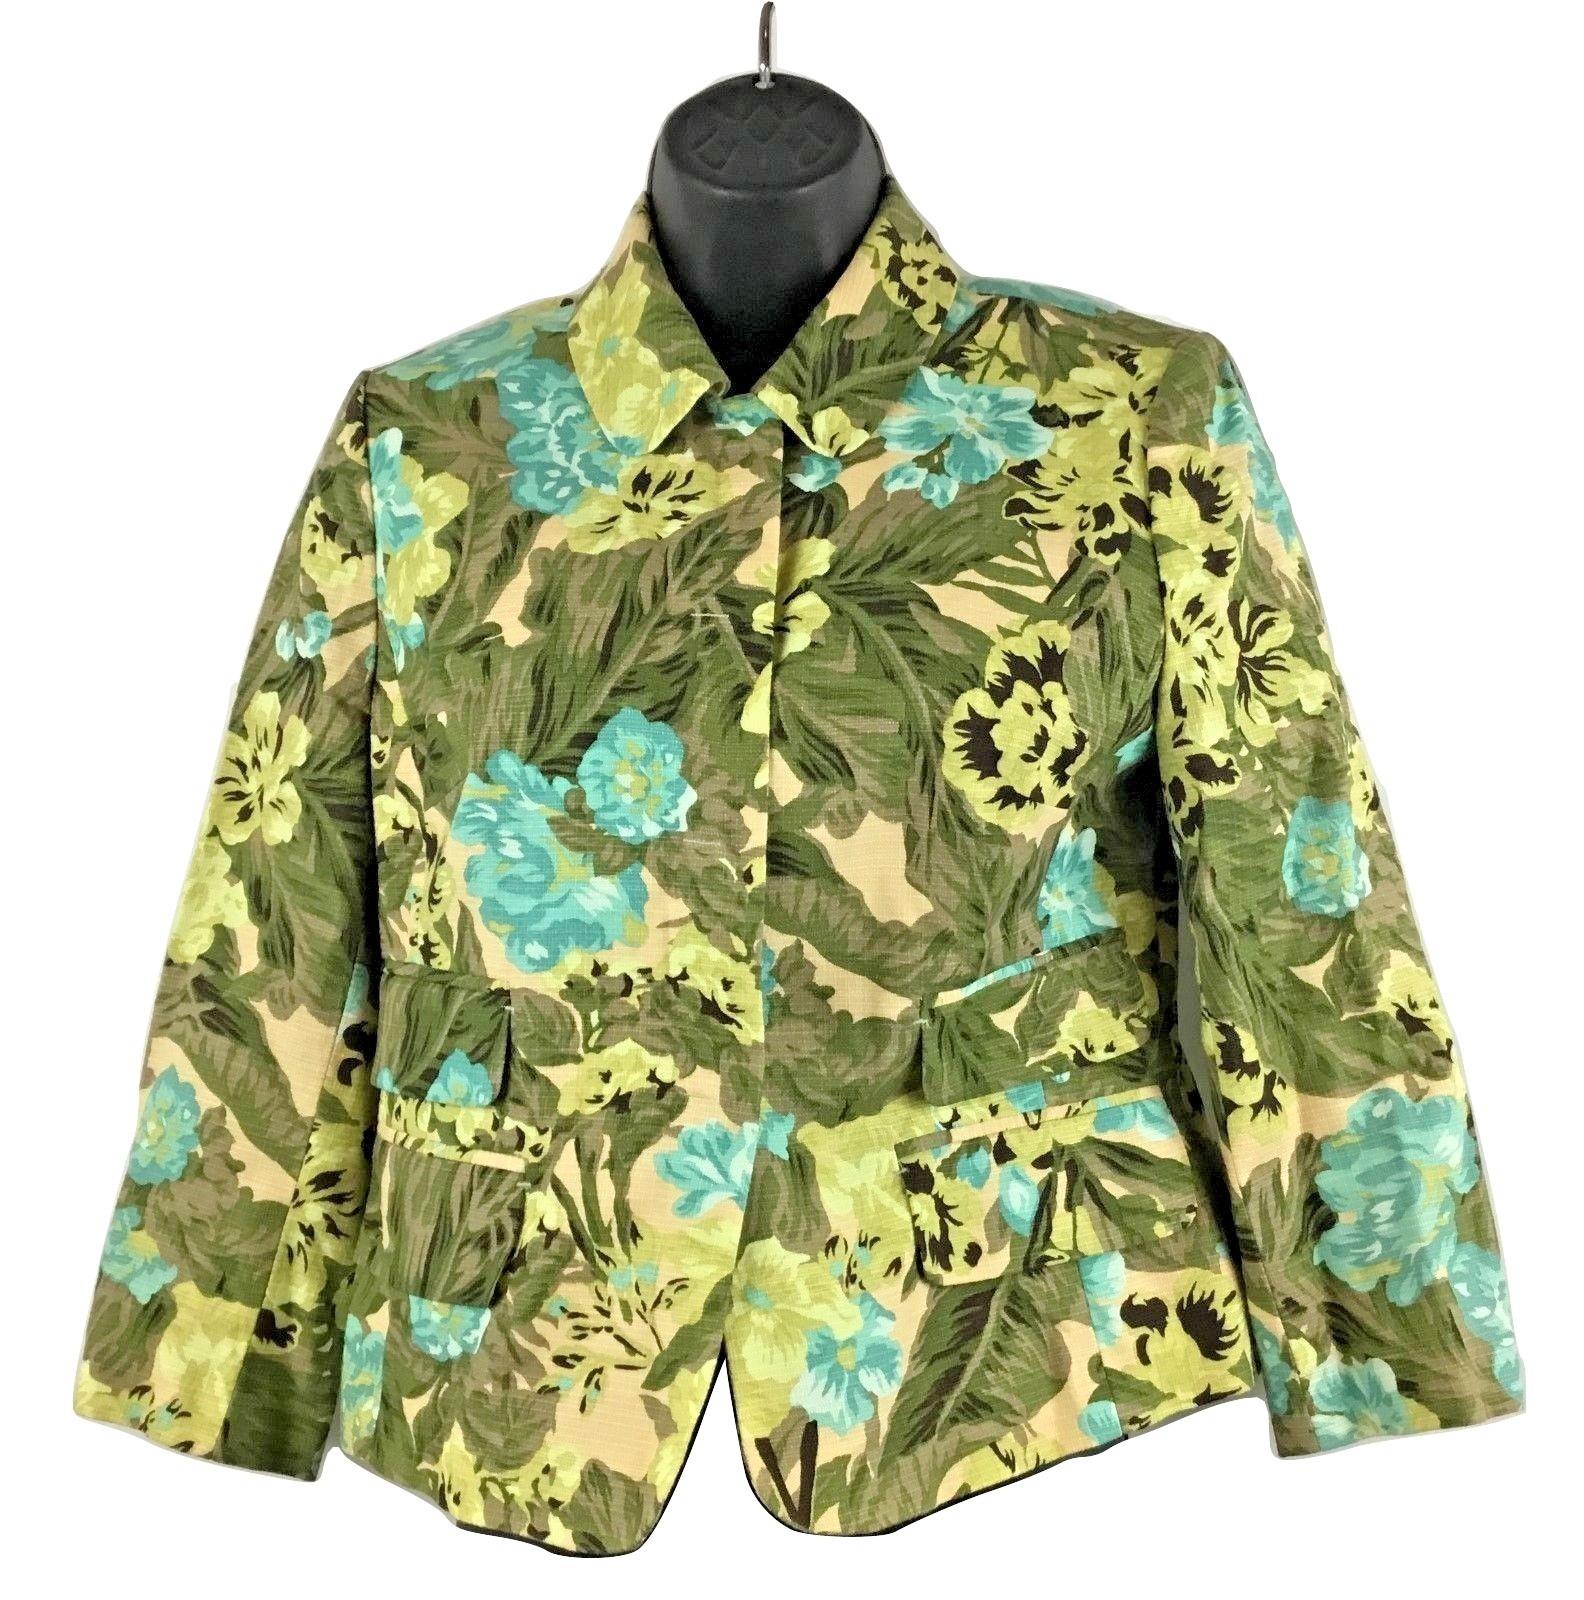 Ann Taylor Loft Long Sleeve Cotton Jacket Green Floral Fully Lined Blazer Size 6 - $23.33